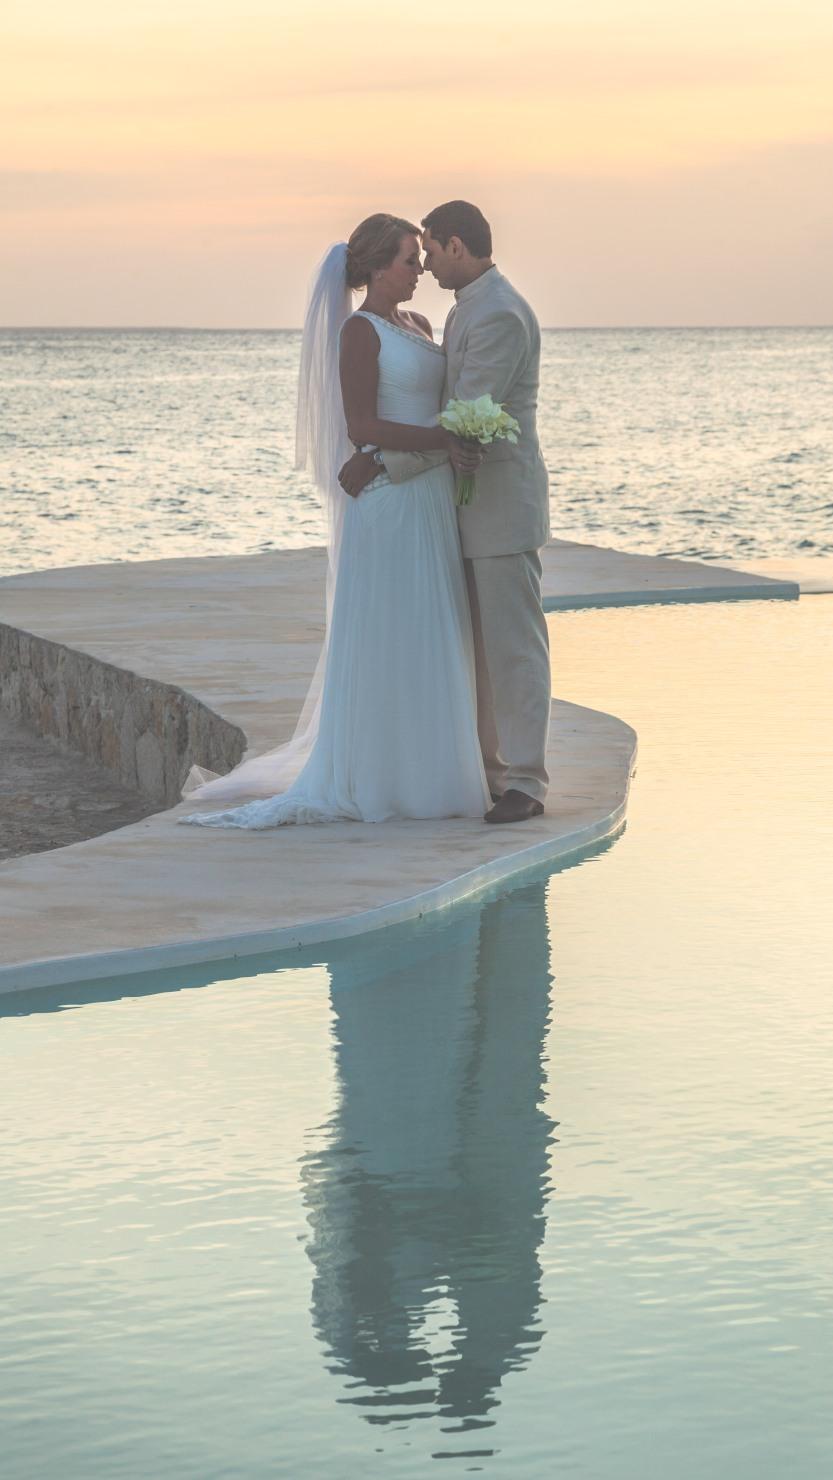 punta-cana-wedding-photographer-ambrogetti-ameztoy-photo-studio-martin-sebastian-tracadero-bayahibe-111